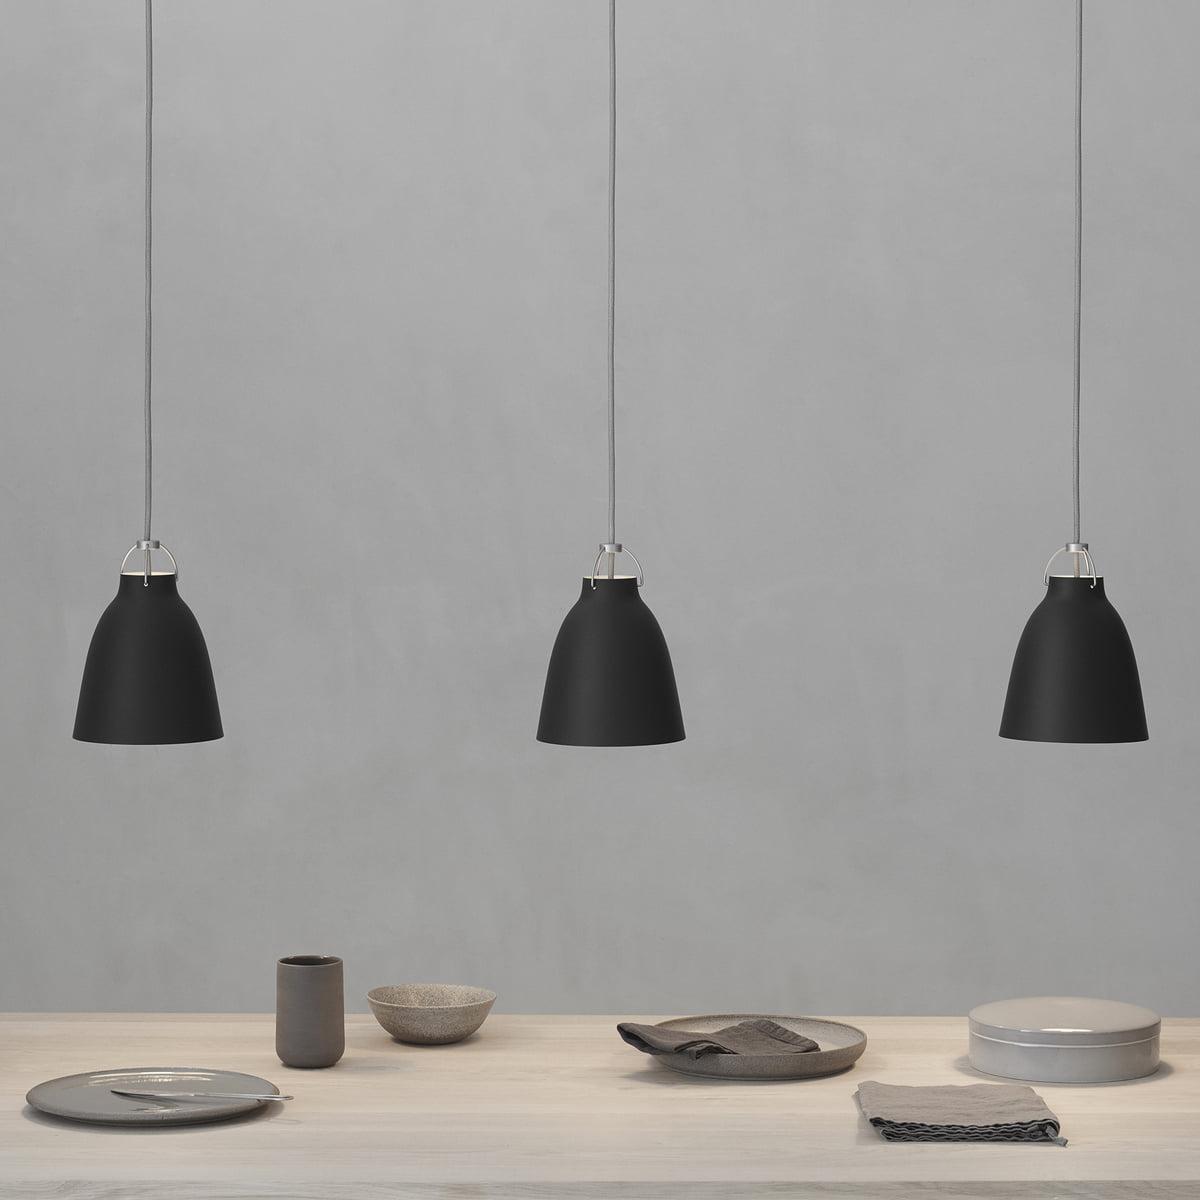 caravaggio p1 pendelleuchte von lightyears. Black Bedroom Furniture Sets. Home Design Ideas